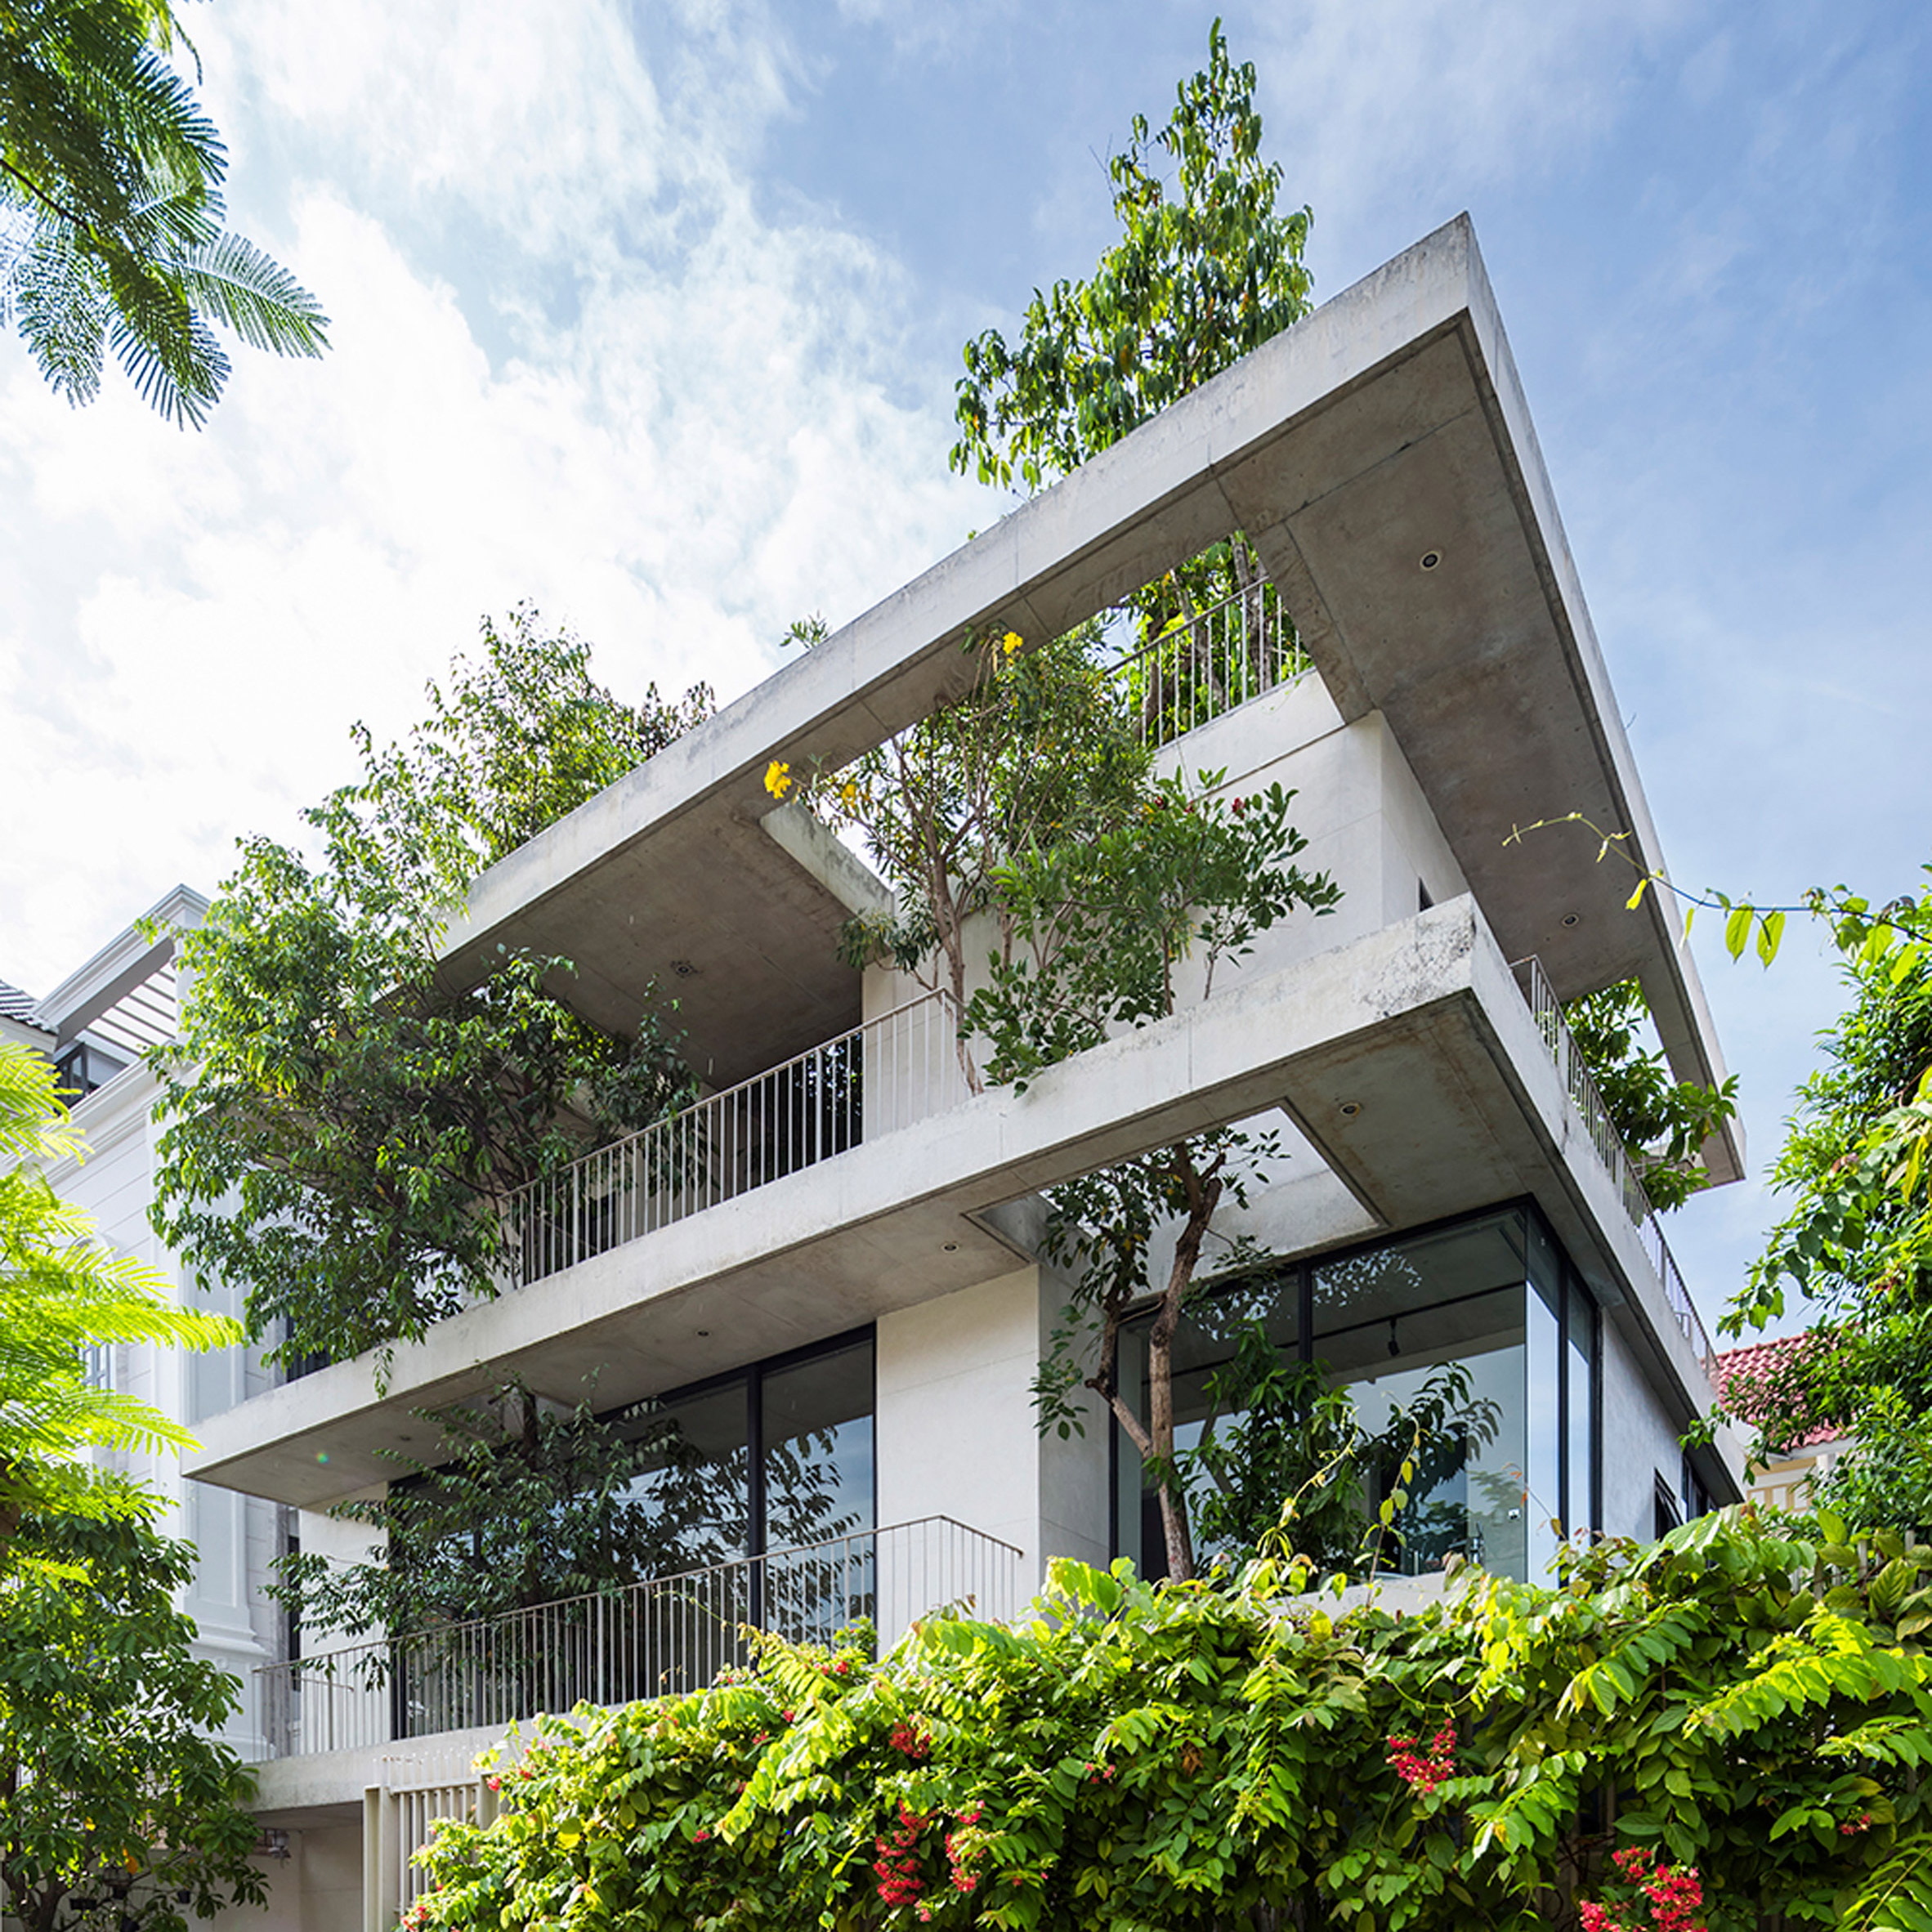 House design and architecture in Vietnam   Dezeen